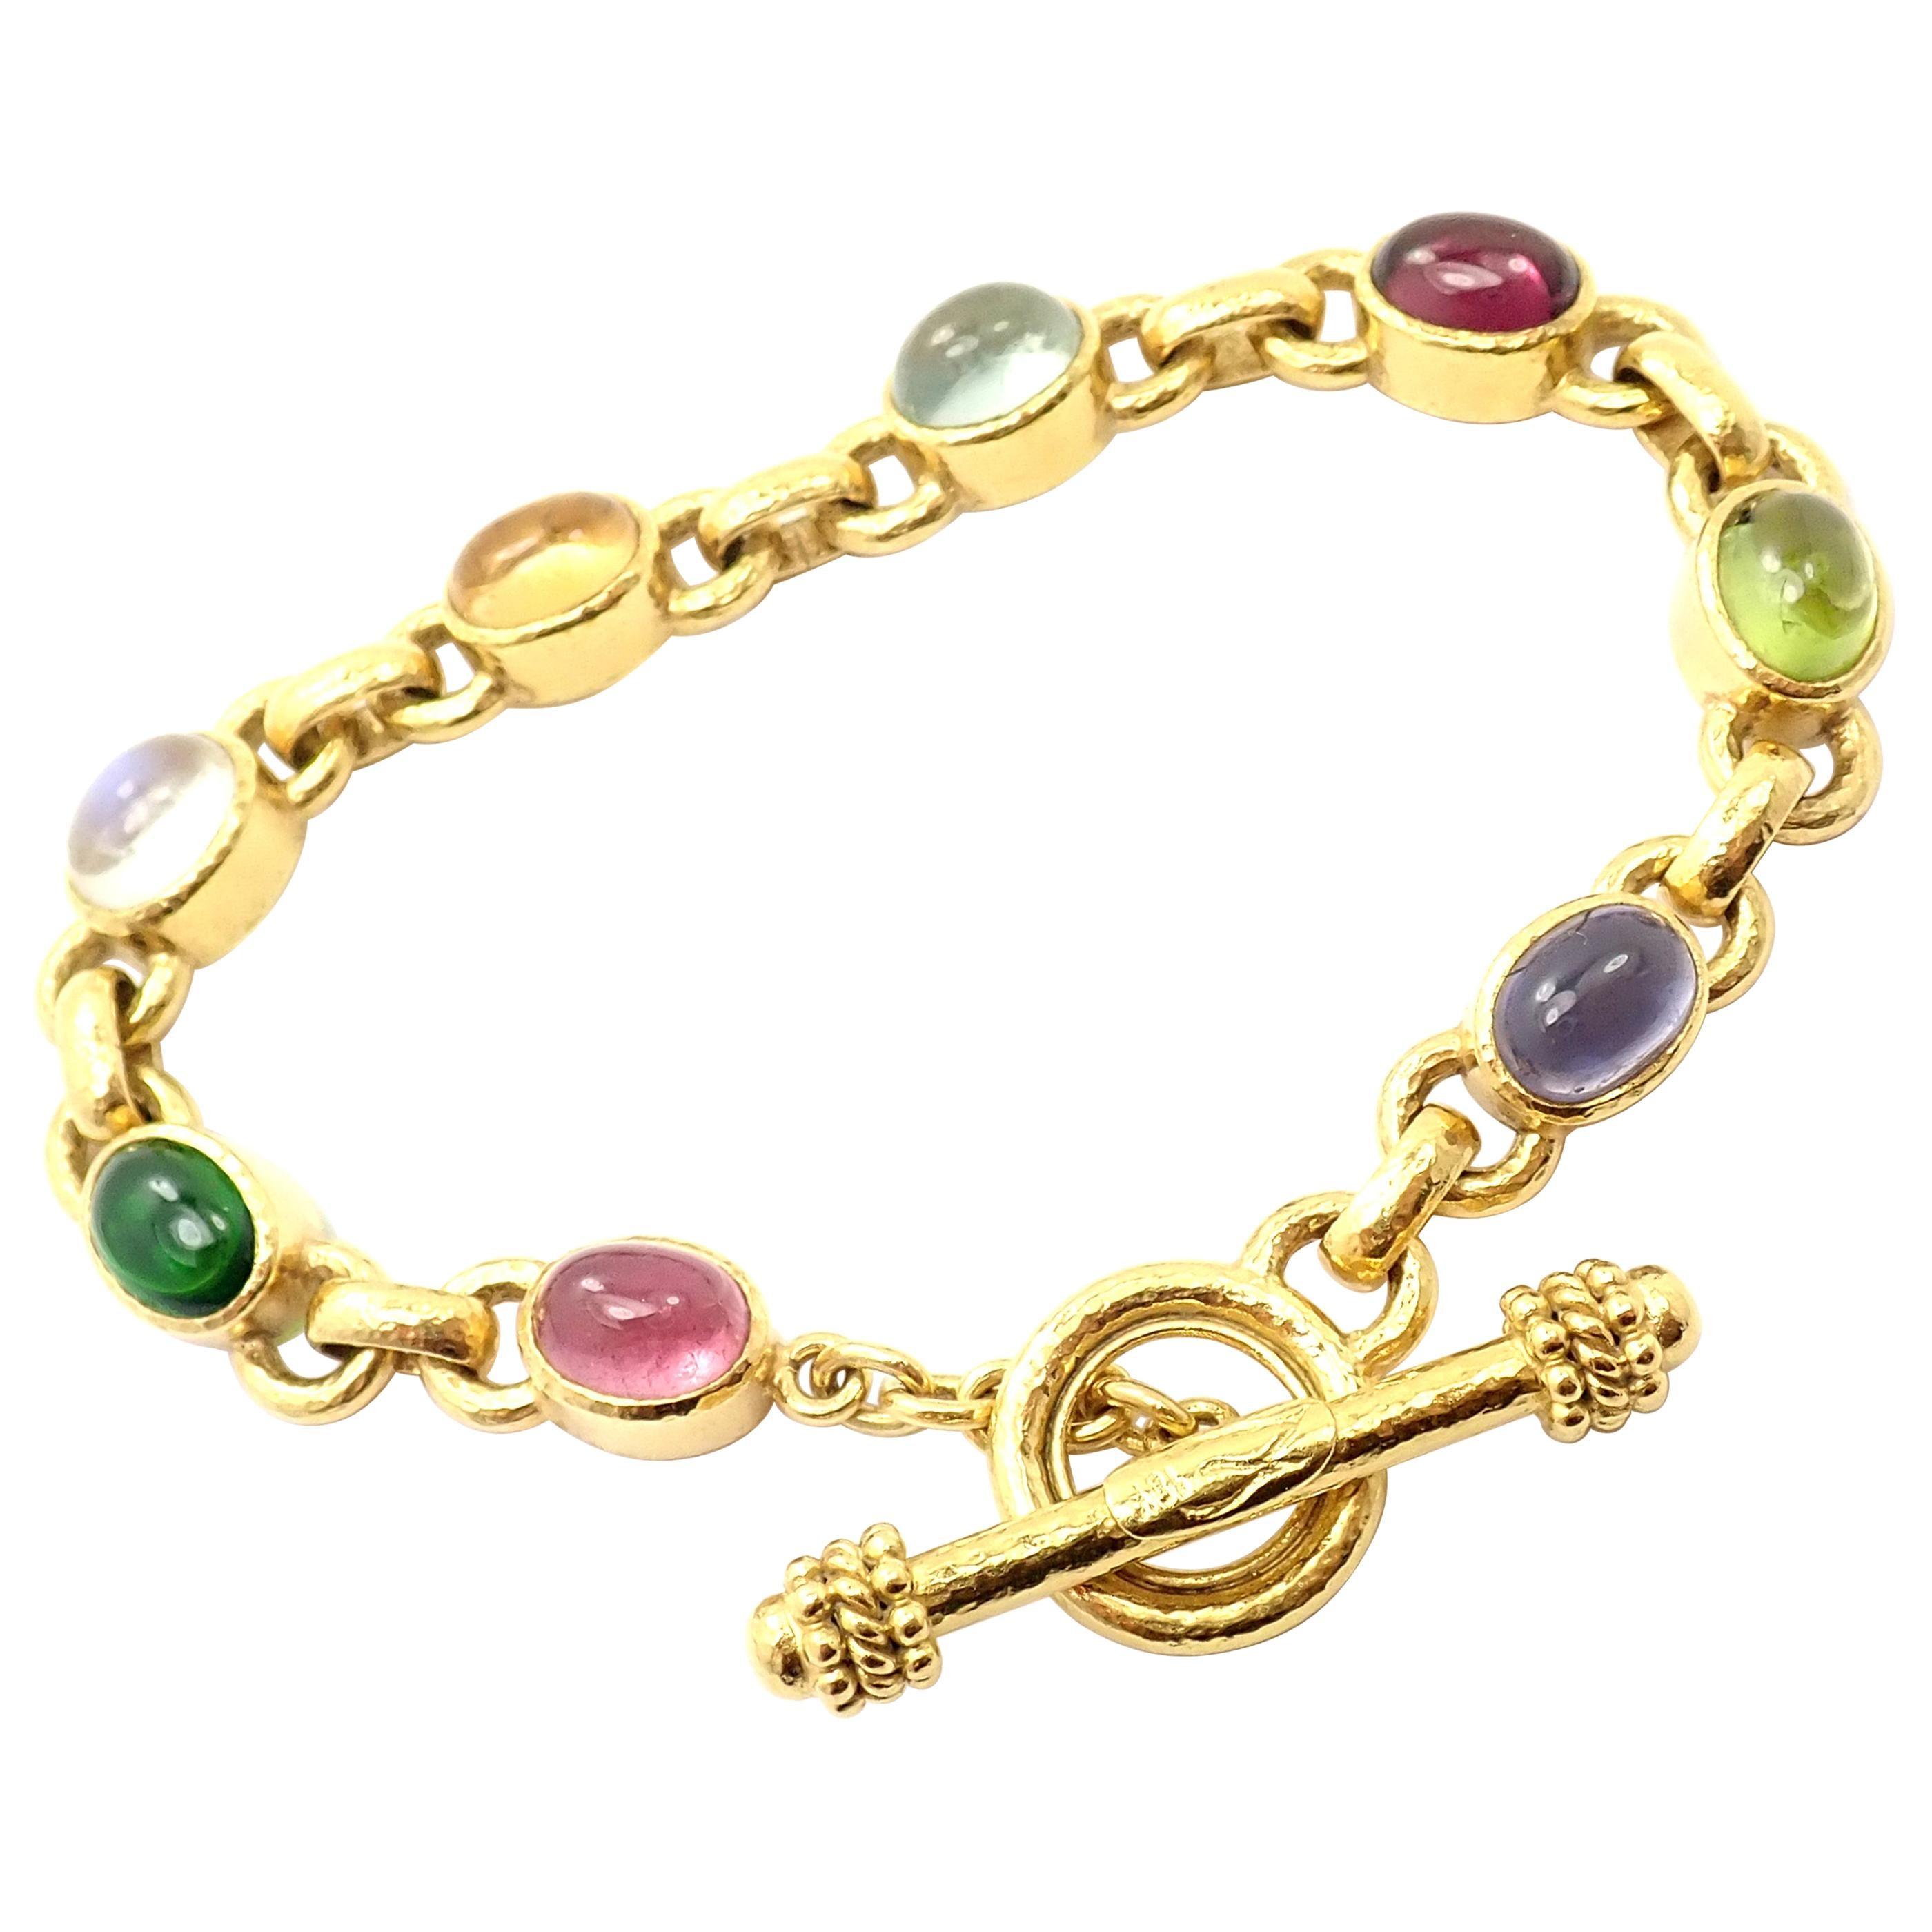 Elizabeth Locke Tutti Frutti Color Stone Toggle Yellow Gold Link Bracelet